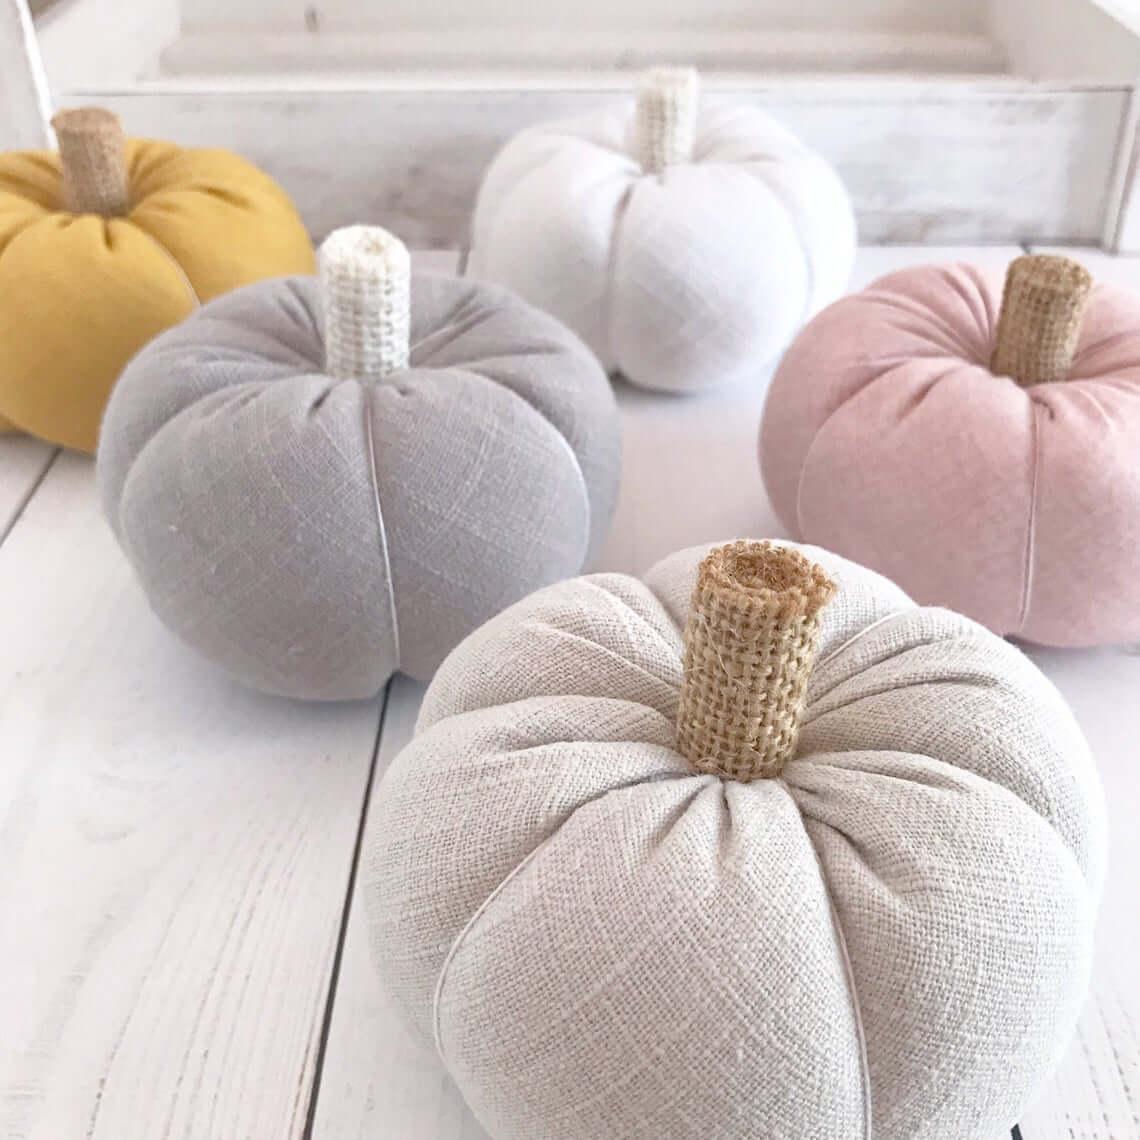 Gorgeous Burlap and Tweed Textured Fabric Pumpkins